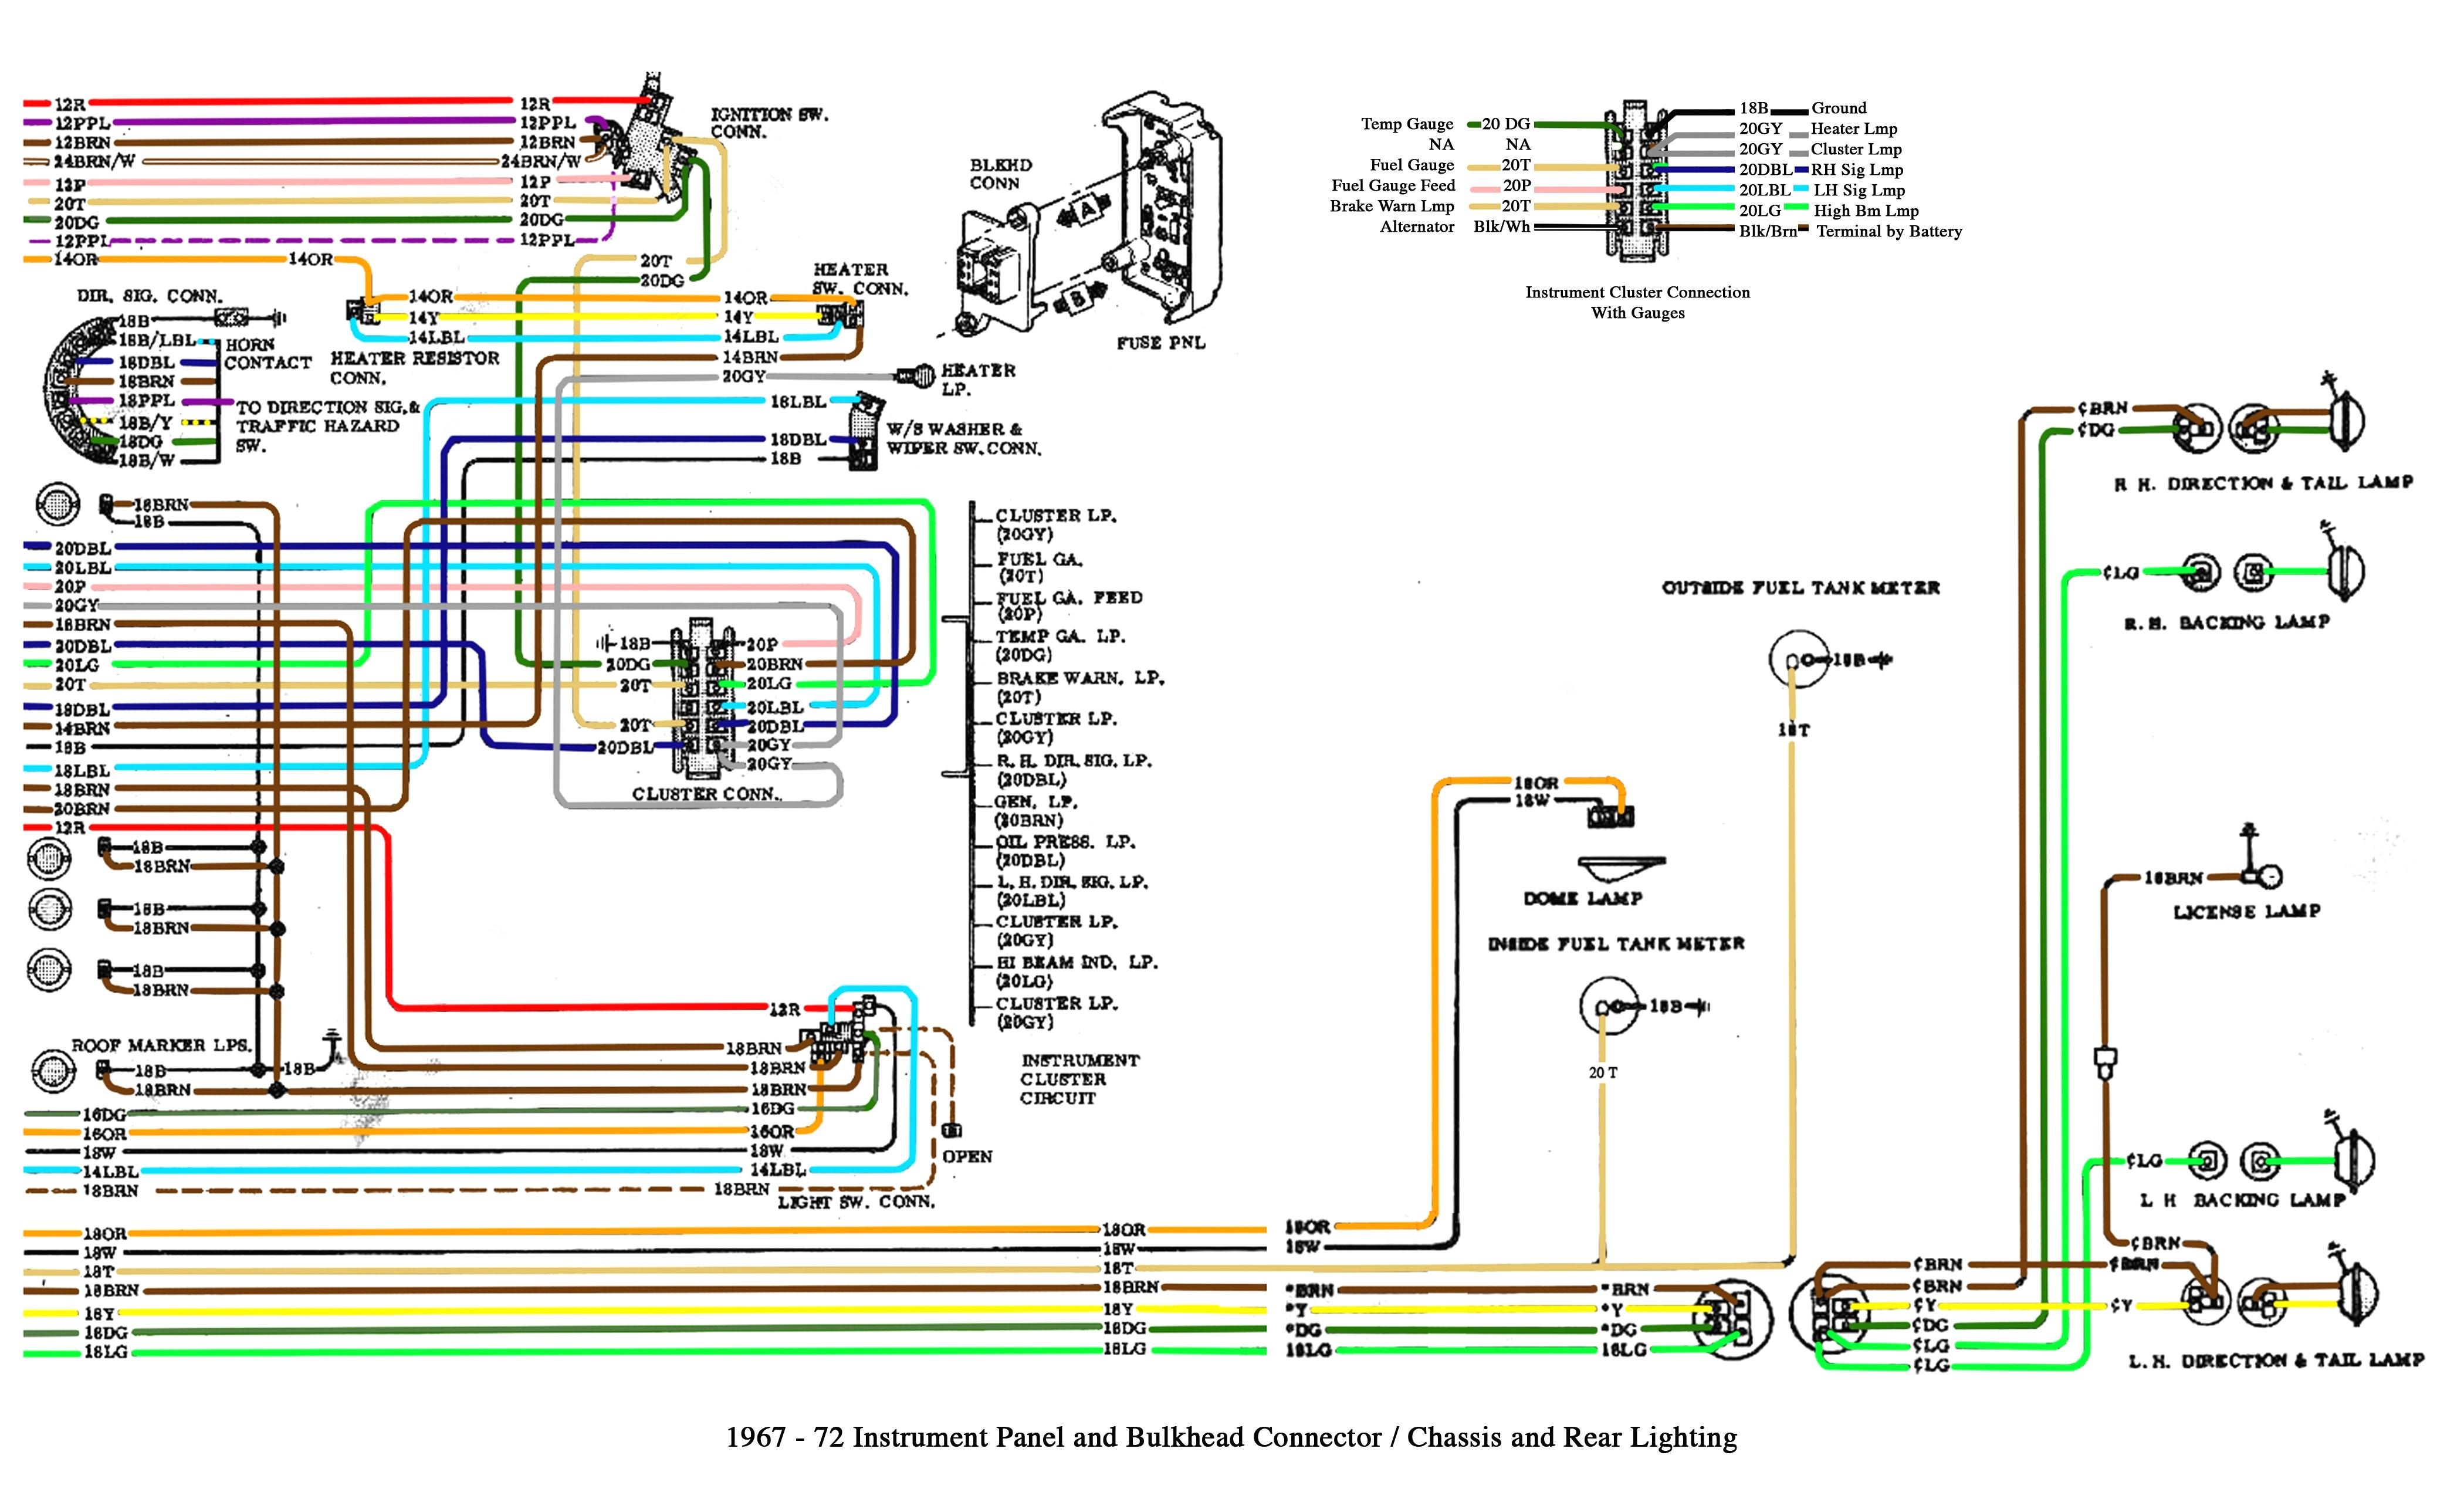 2004 Silverado Wiring Schematics   Wiring Library - 2003 Chevy Silverado Trailer Wiring Diagram